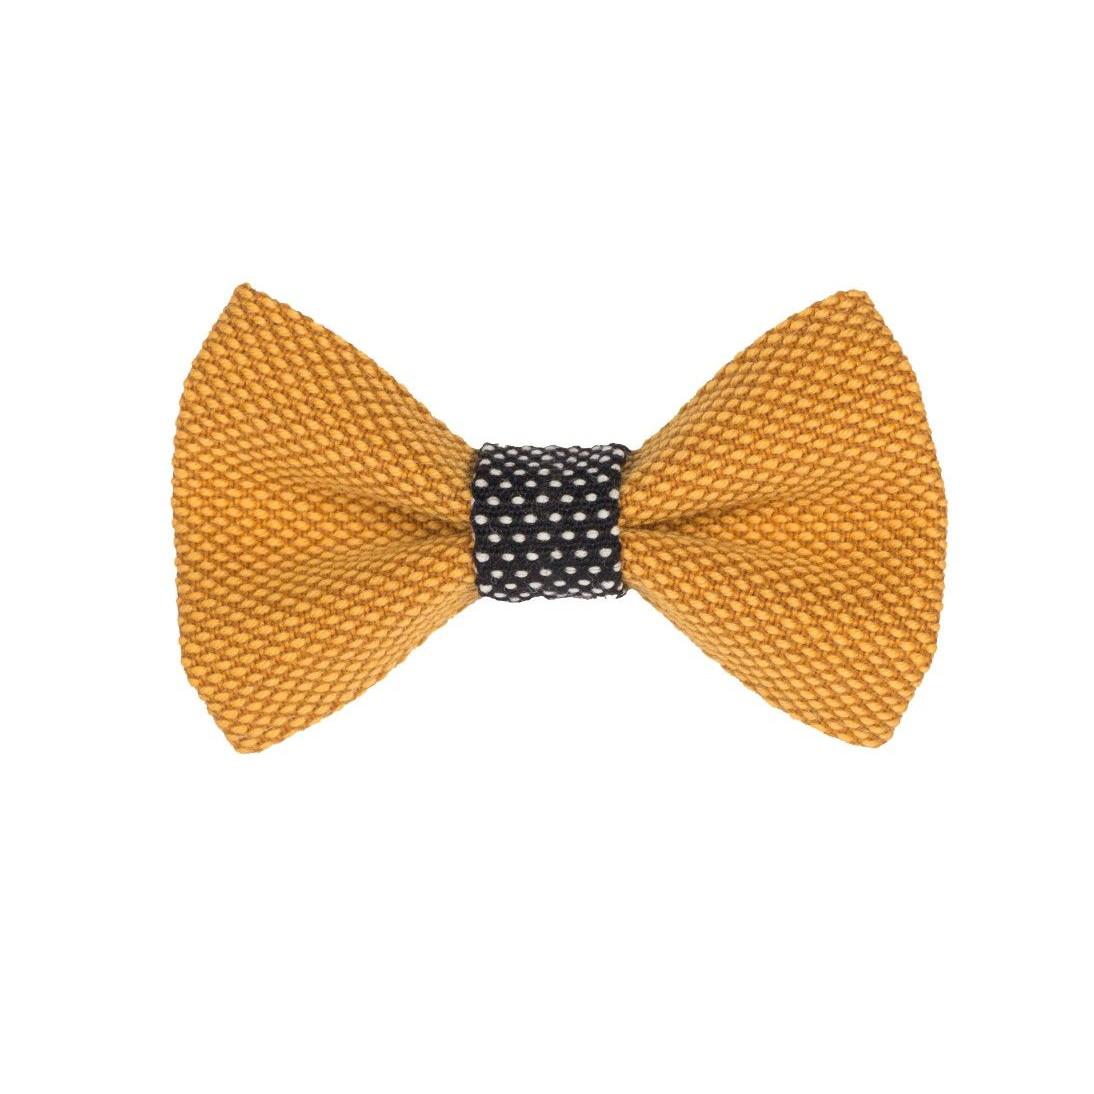 Yumi Bow Tie | Yellow-Black